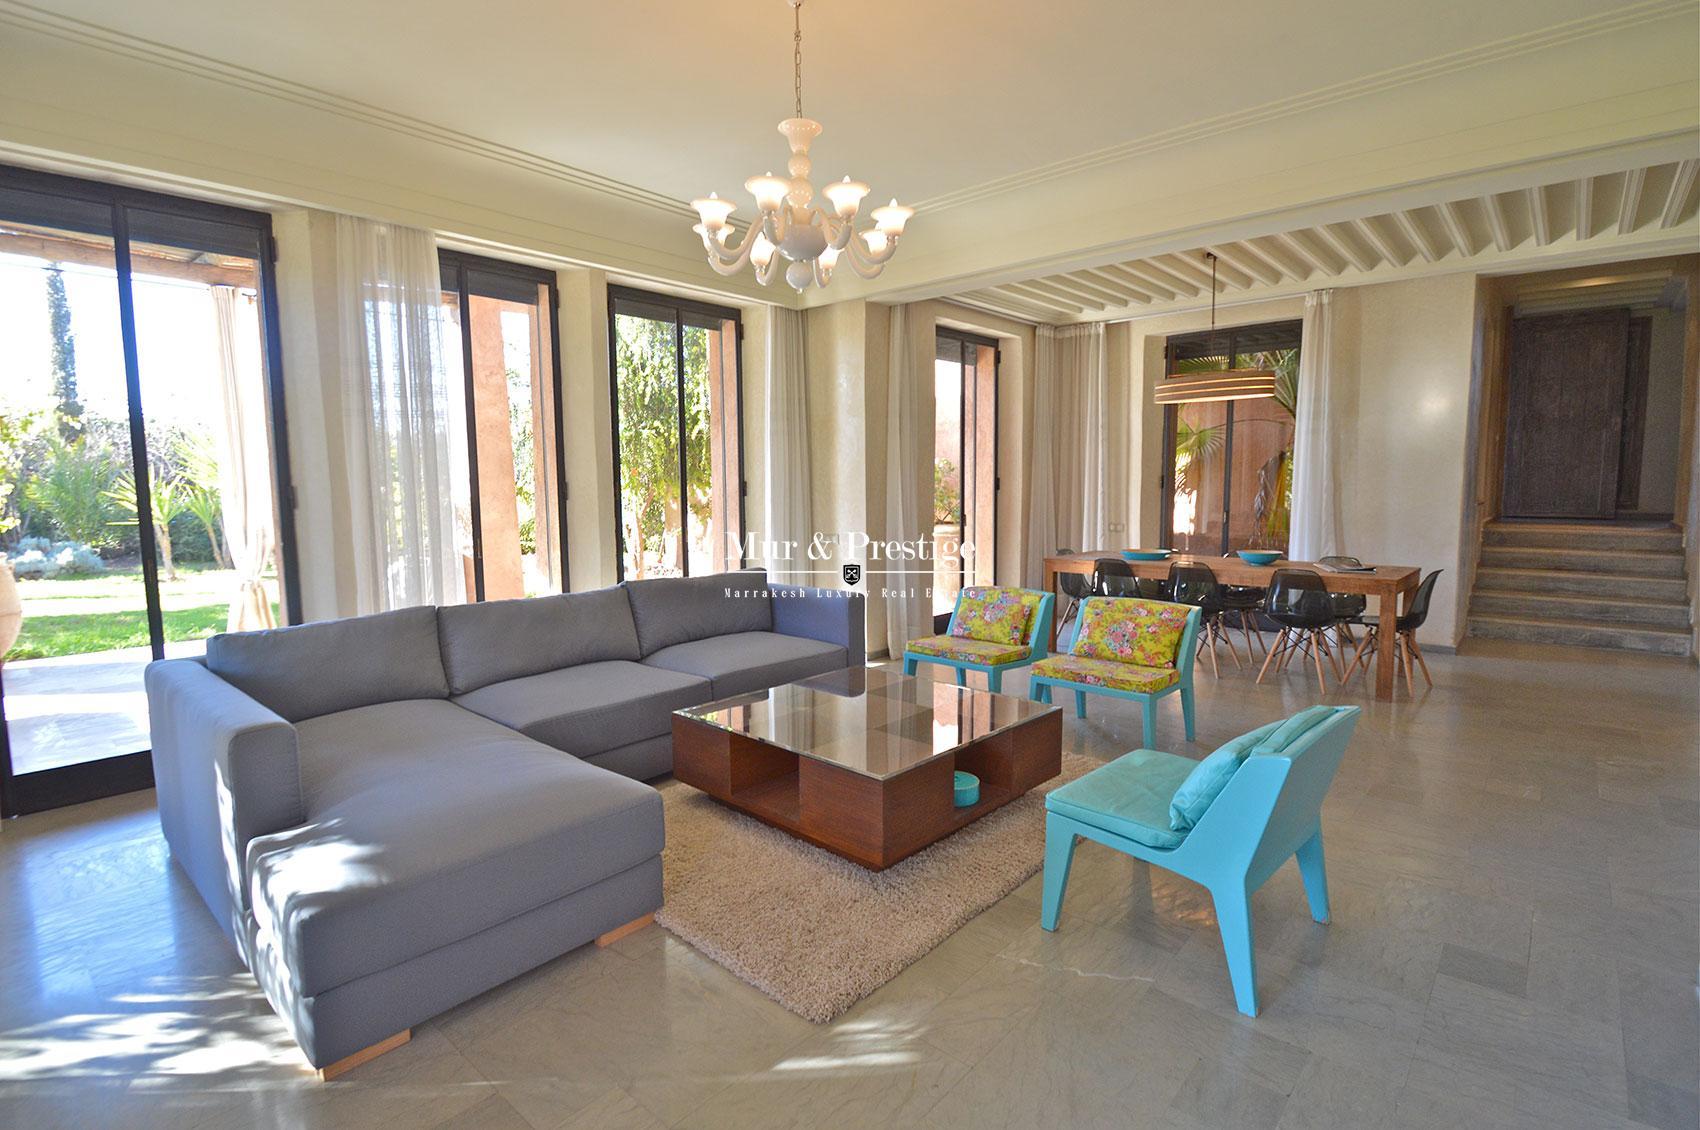 Immobilier de luxe a Marrakech